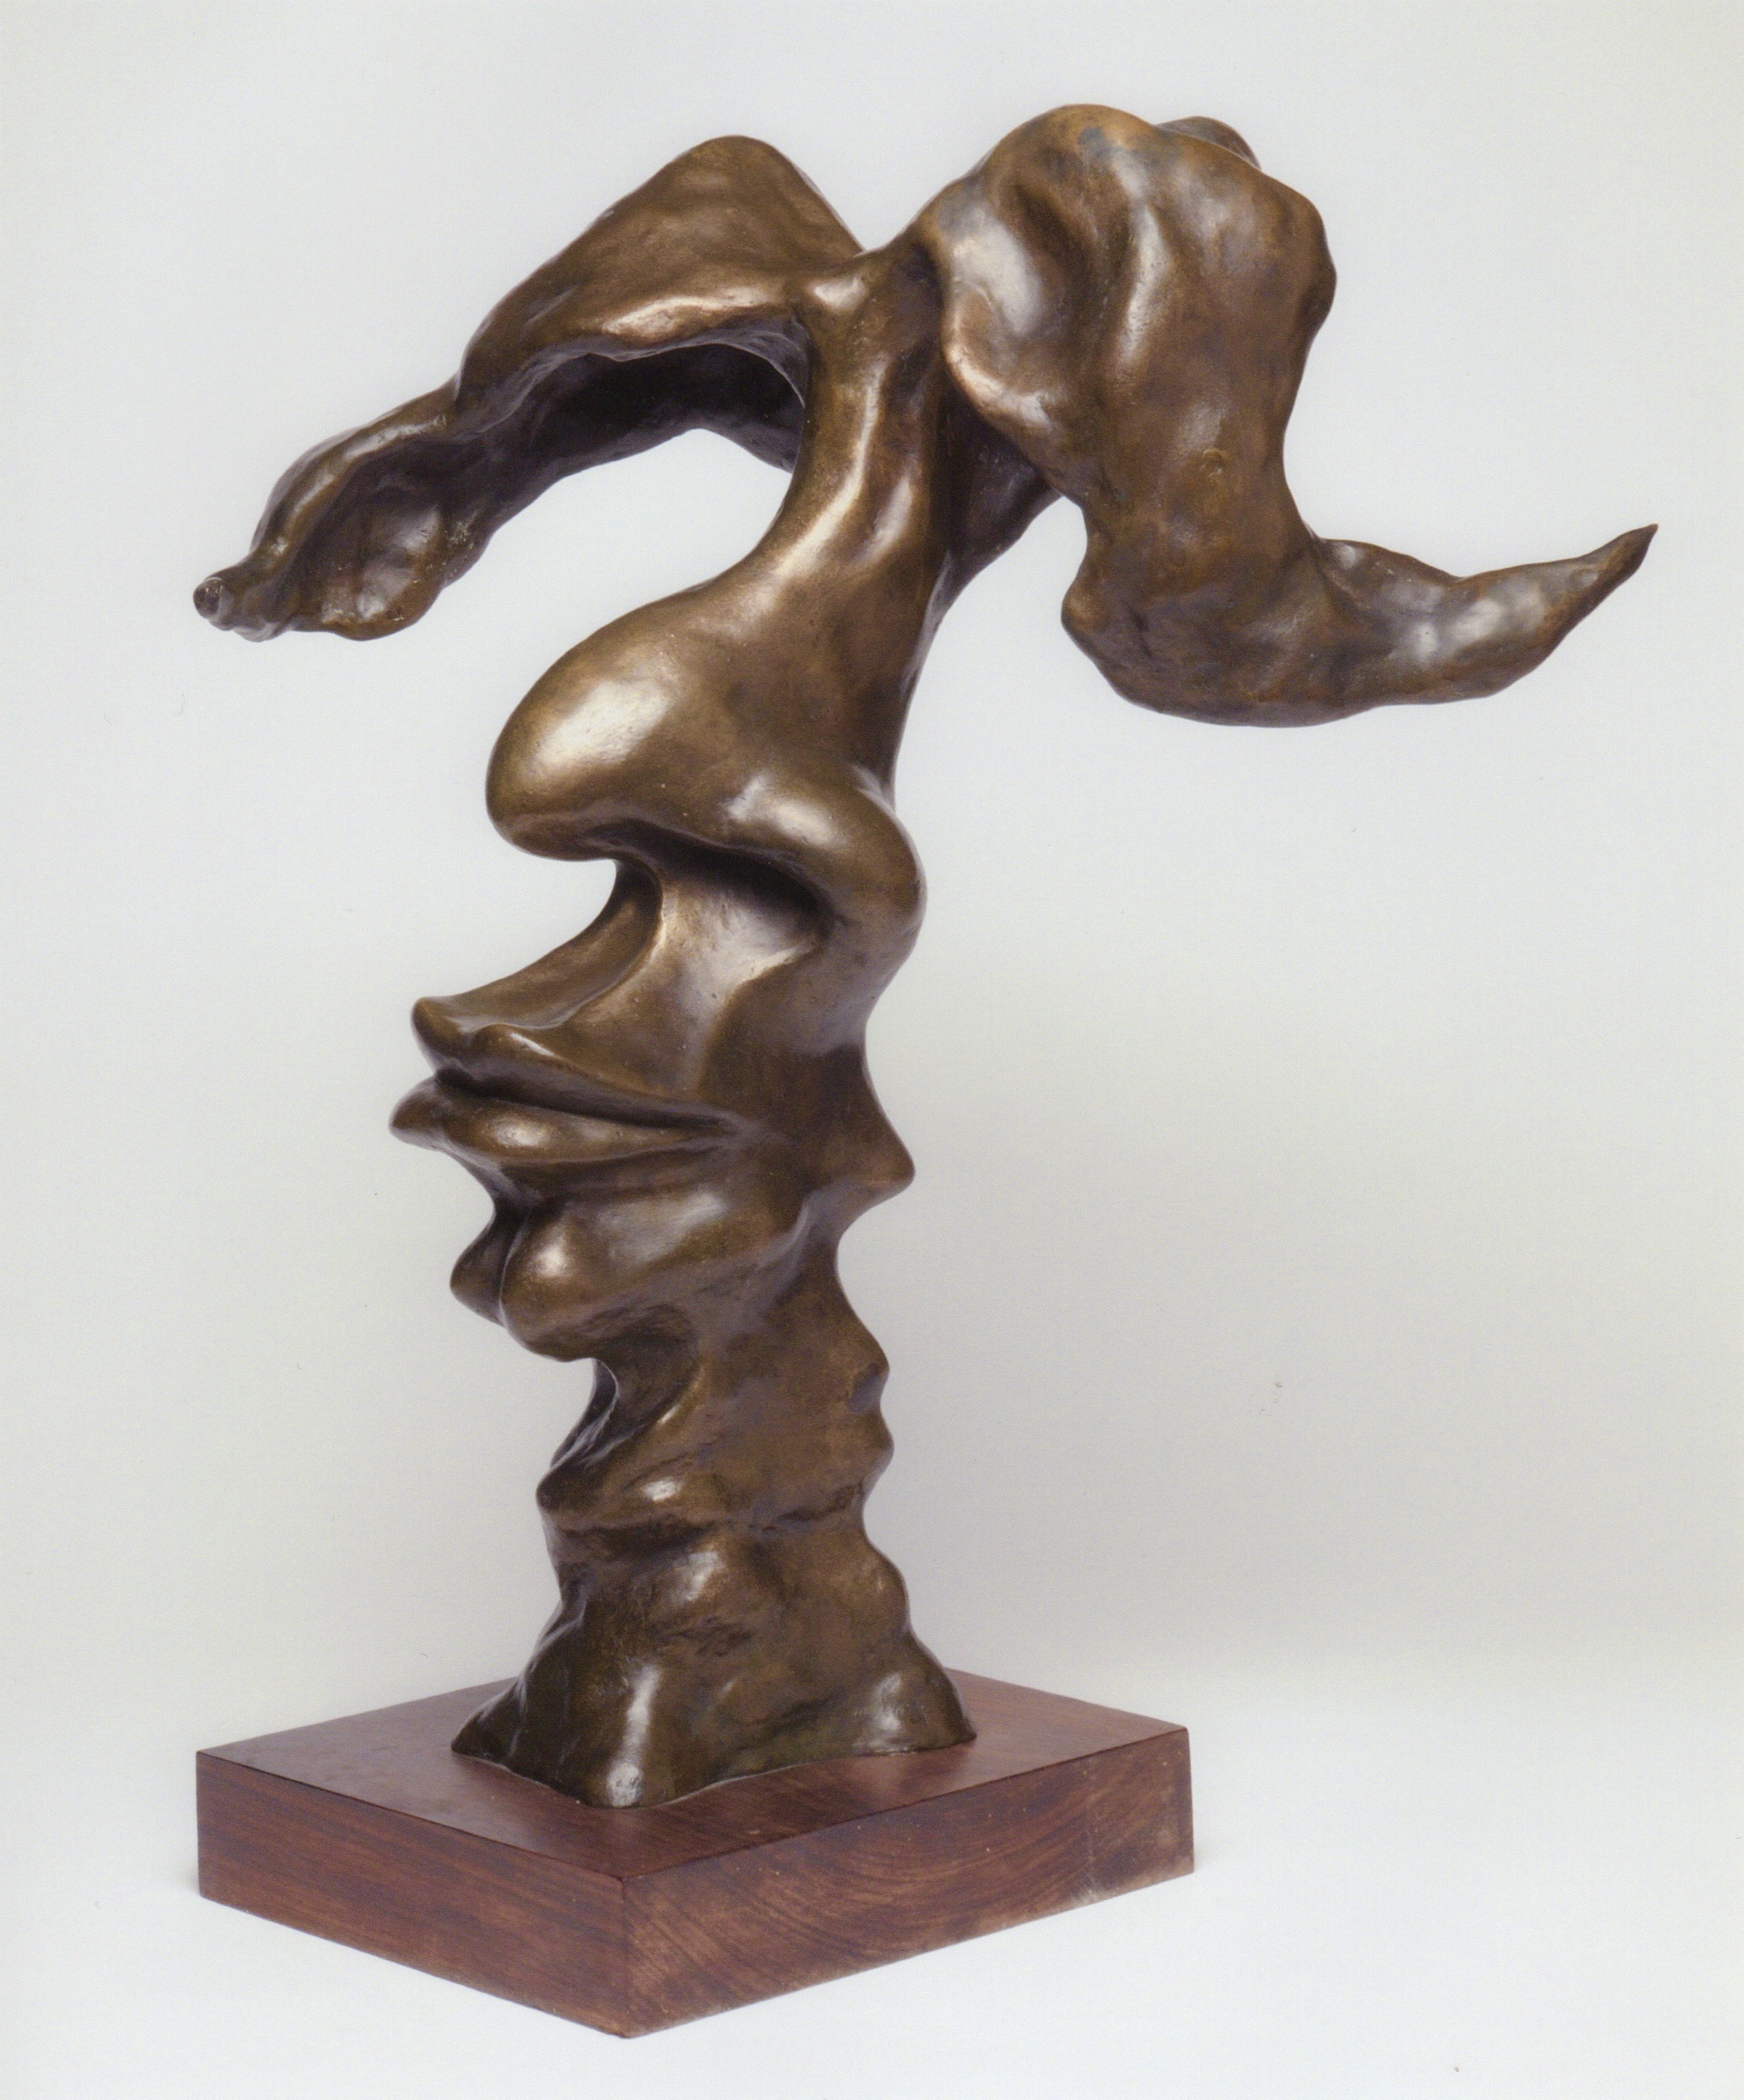 1. Sculpture 7 copy.jpg